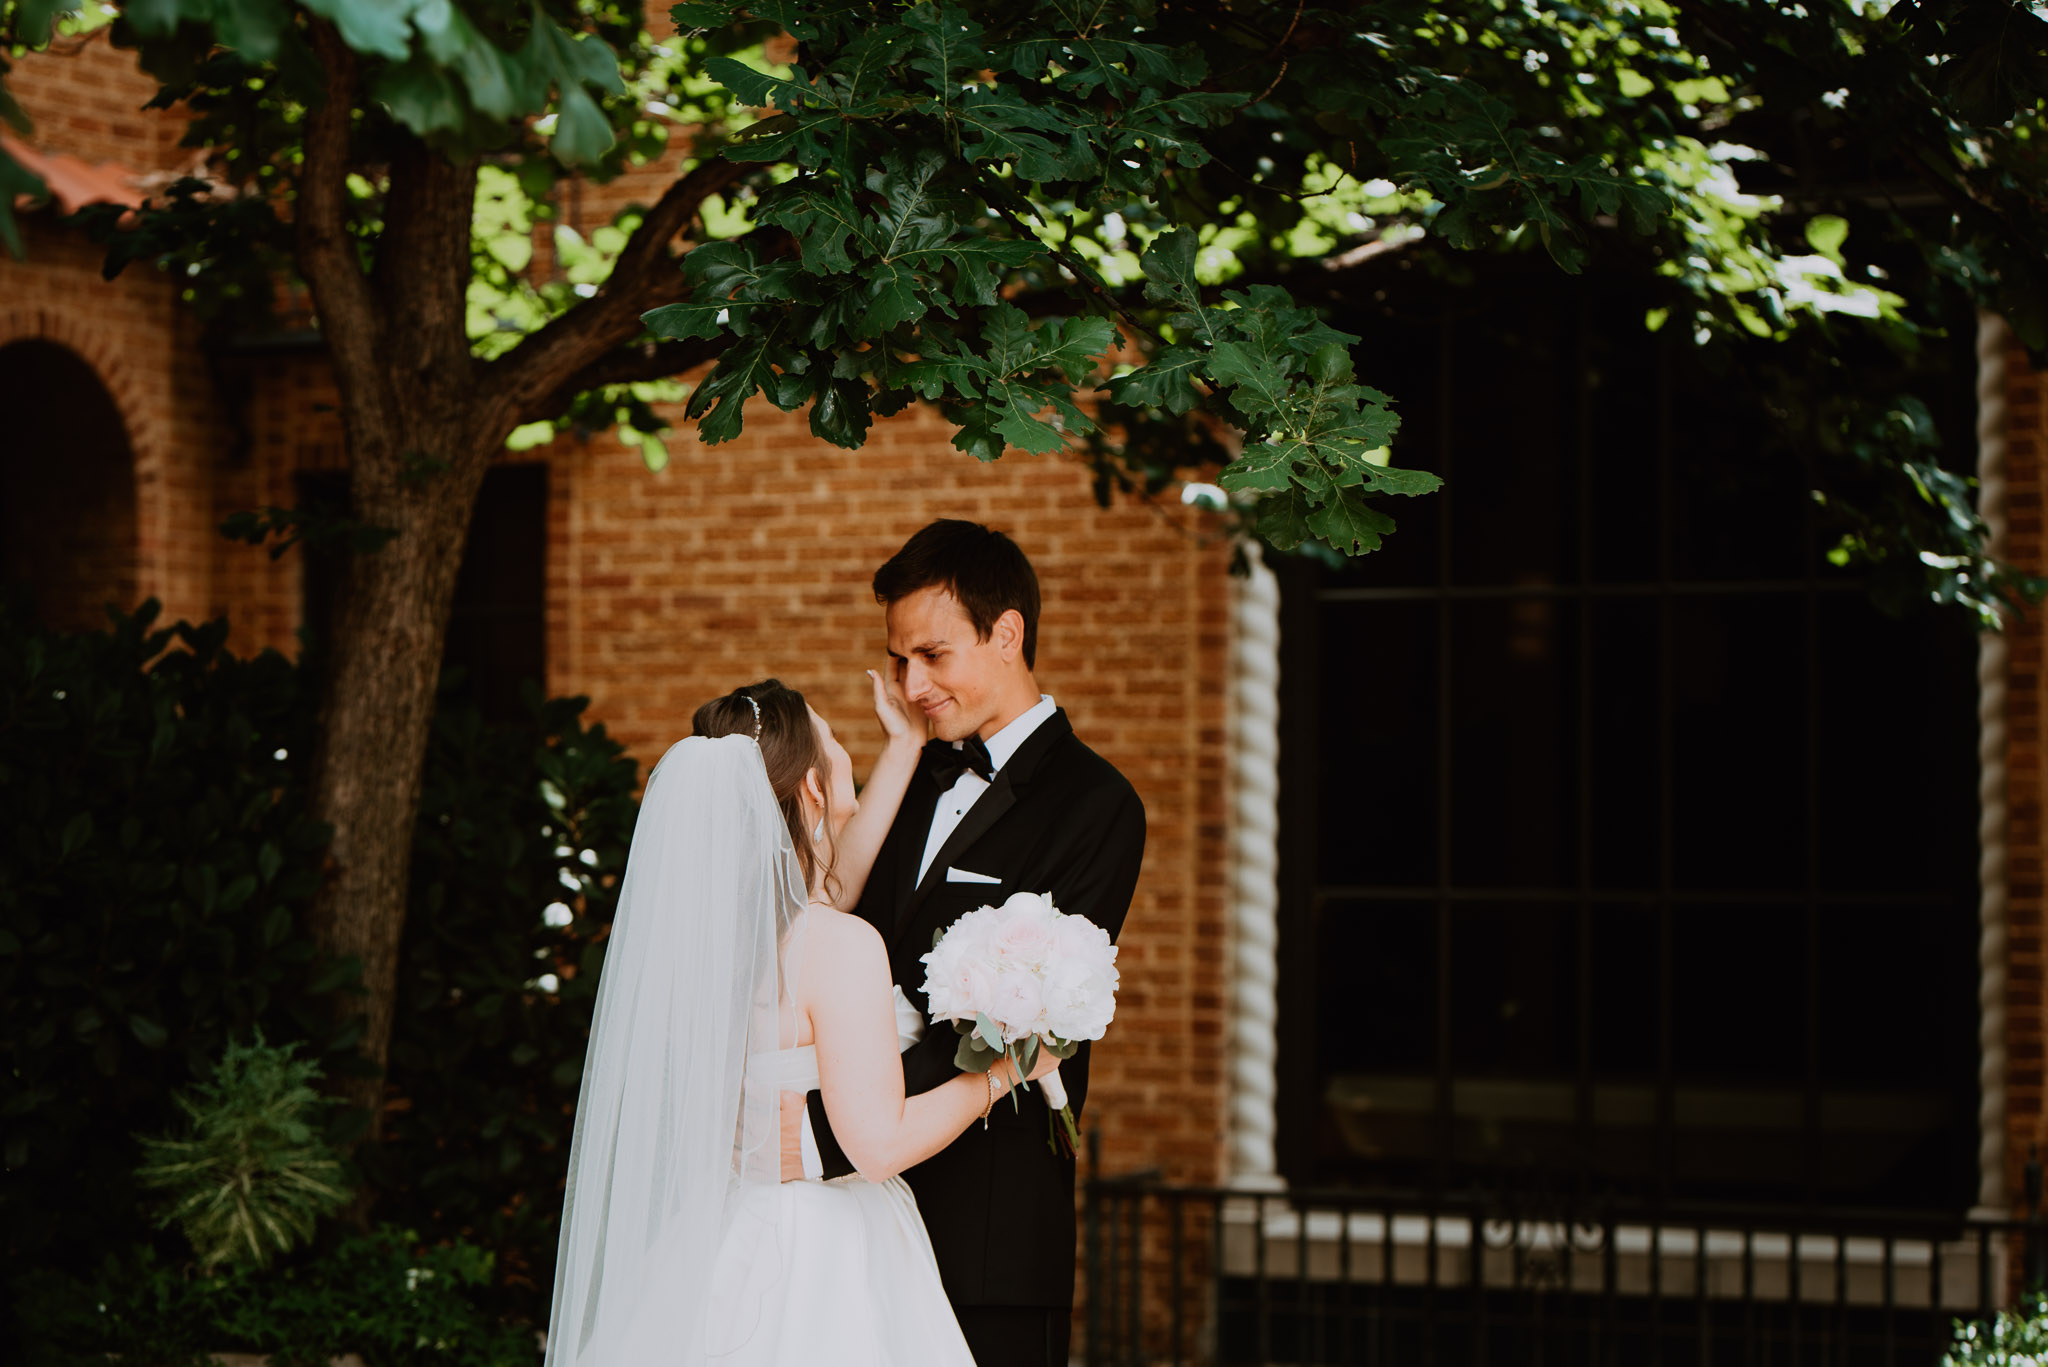 Bentwood-country-club-wedding-shea-tyson-0009.jpg